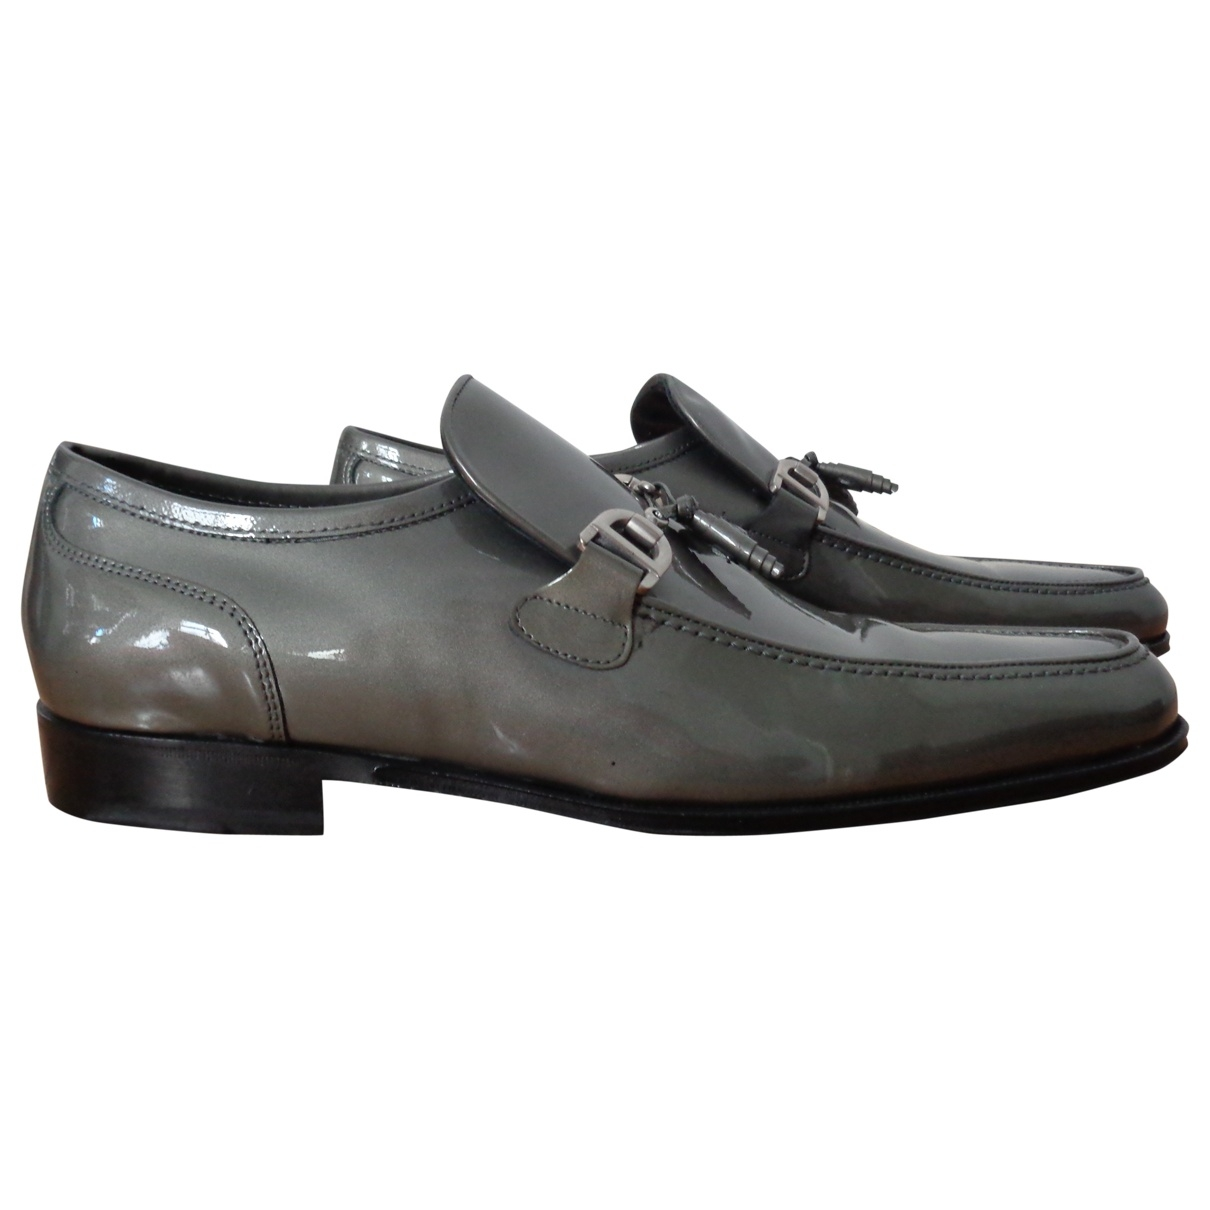 Dolce & Gabbana \N Grey Patent leather Flats for Men 40.5 EU